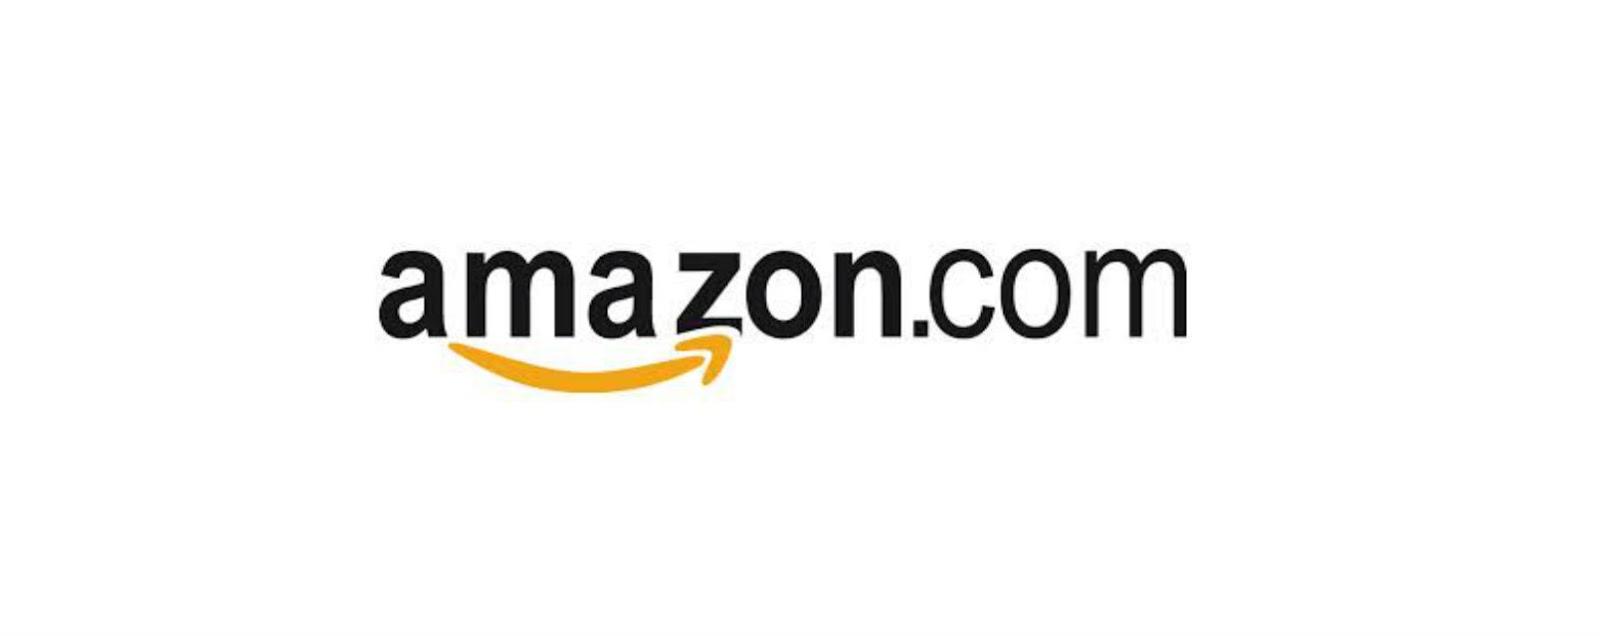 Amazon Registration Link For Recruitment Processes - Online